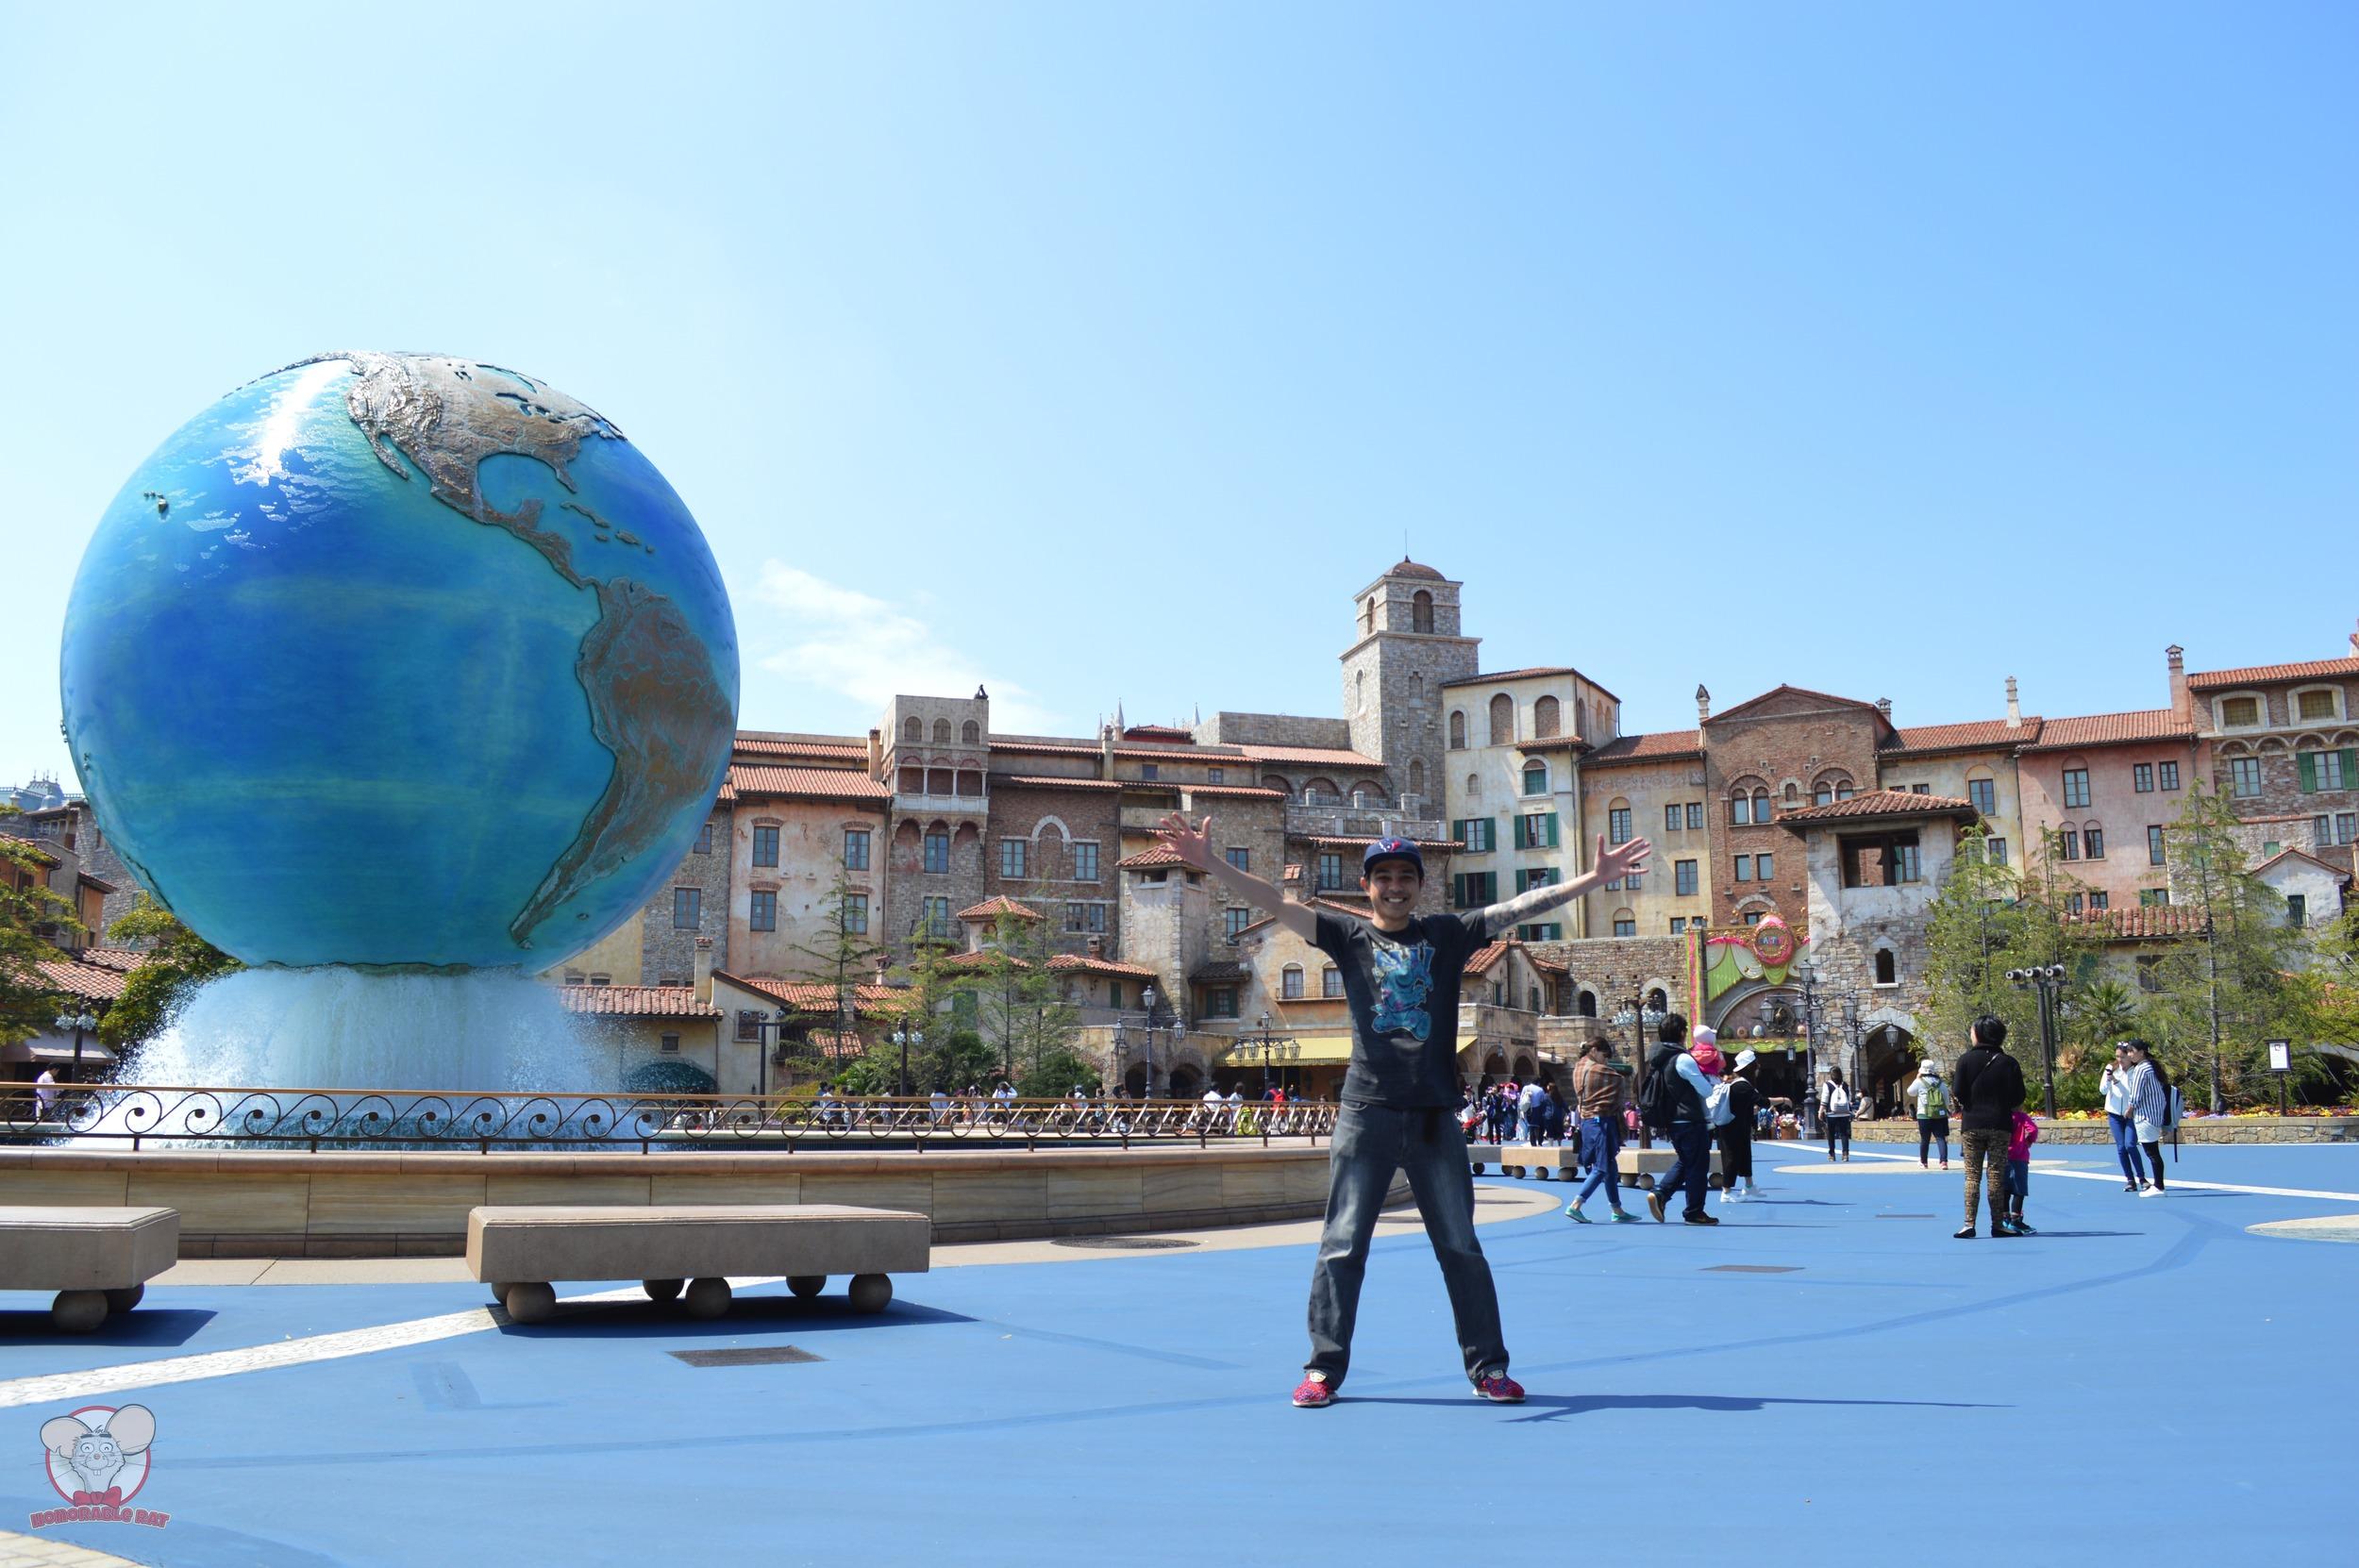 Aquasphere in Tokyo Disneysea